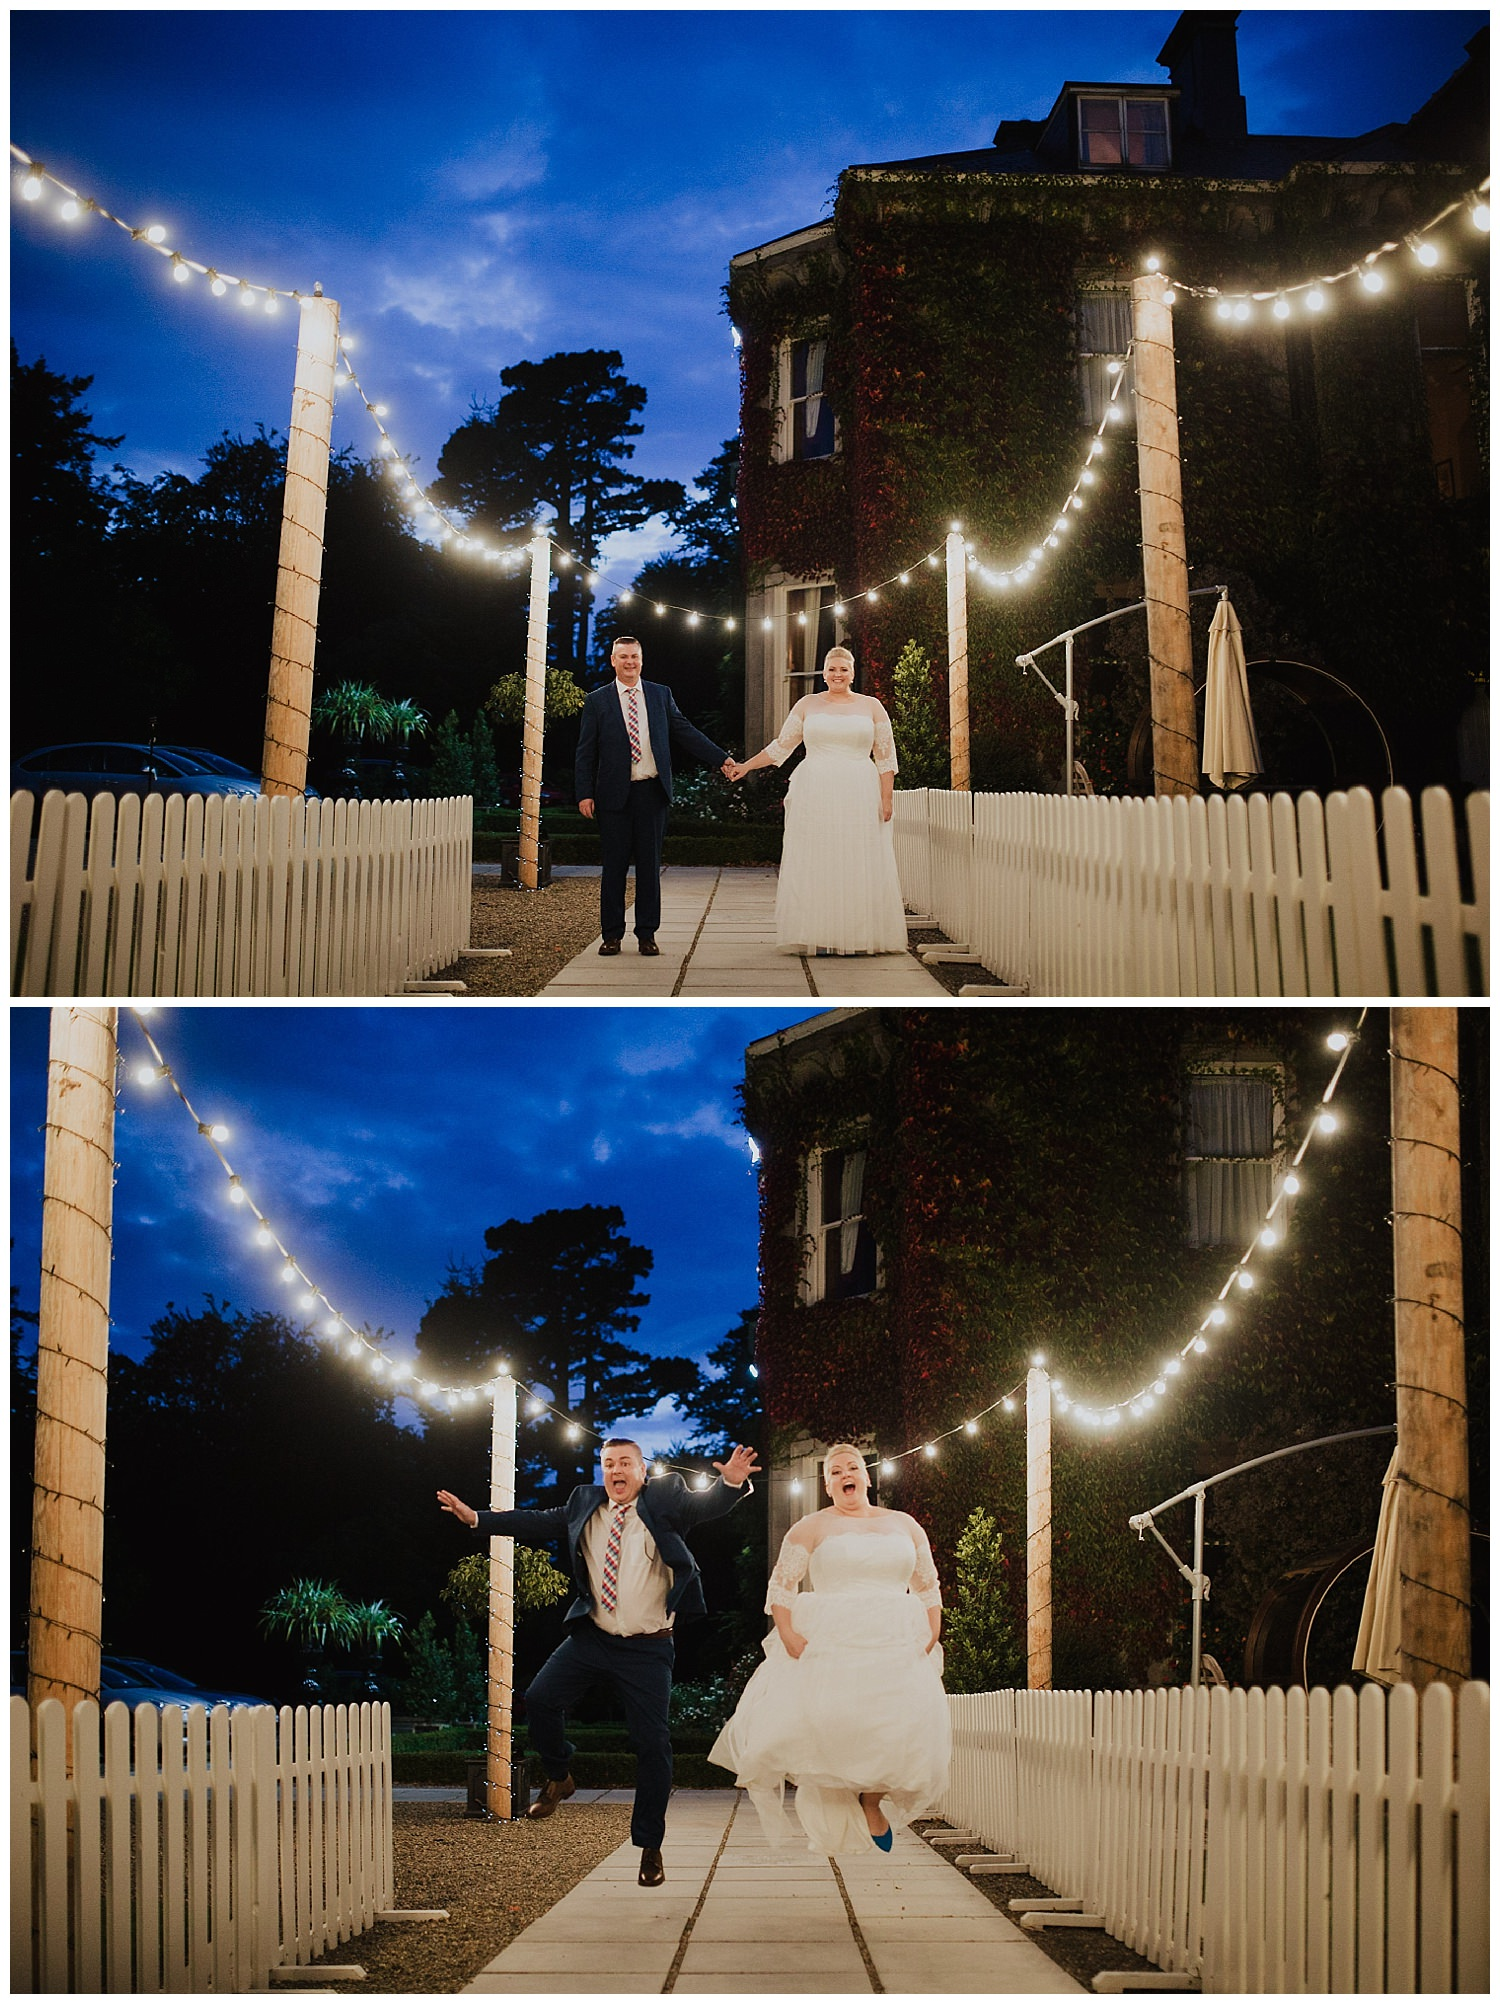 alternative_wedding_tinakilly_house_liviafigueiredo_662.jpg